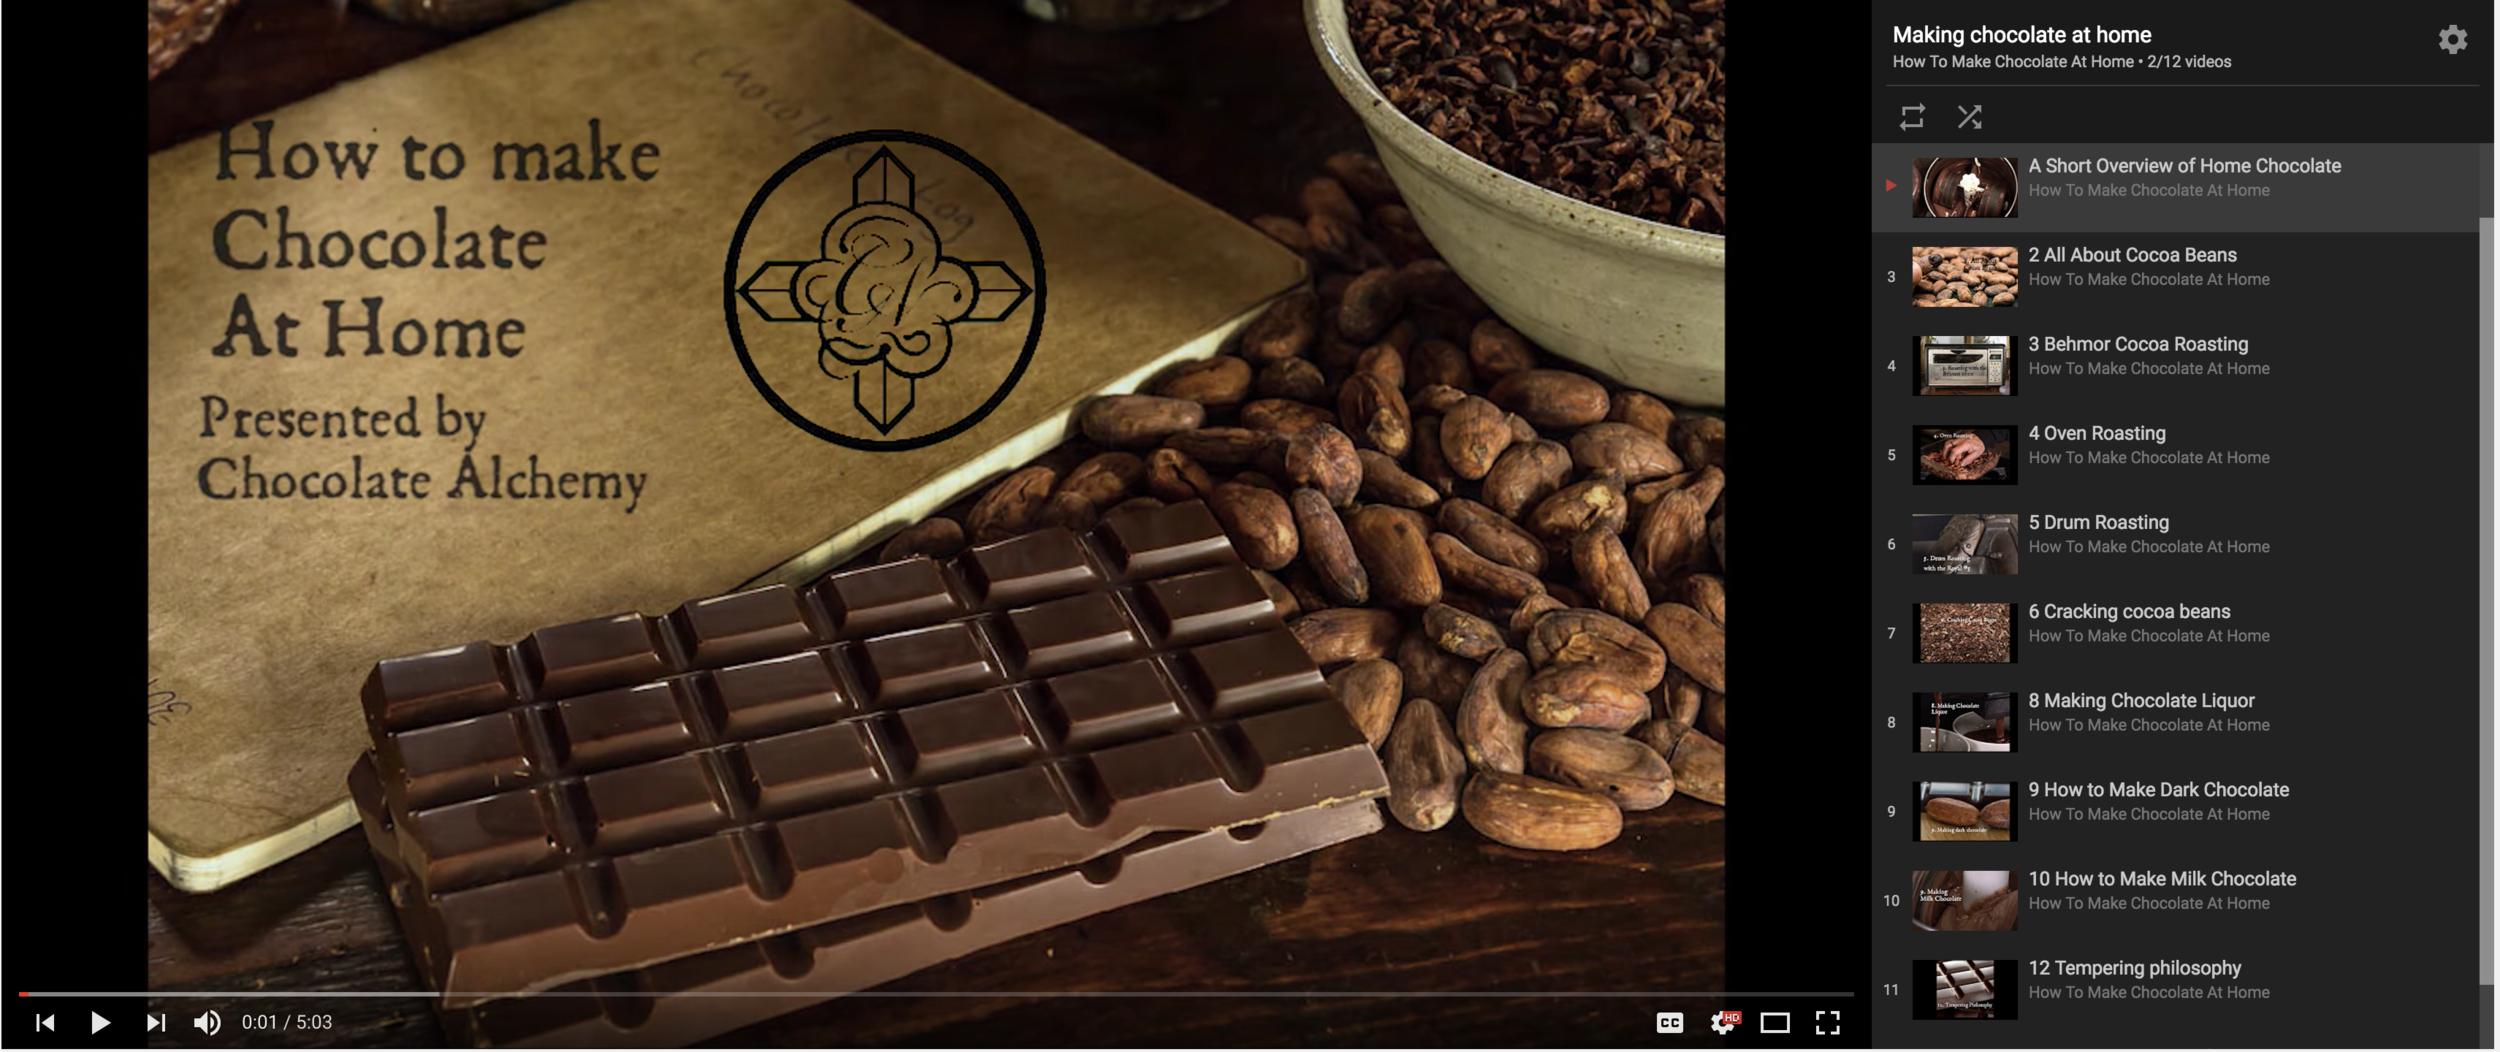 Make Chocolate At Home (VIDEO) — Chocolate Alchemy